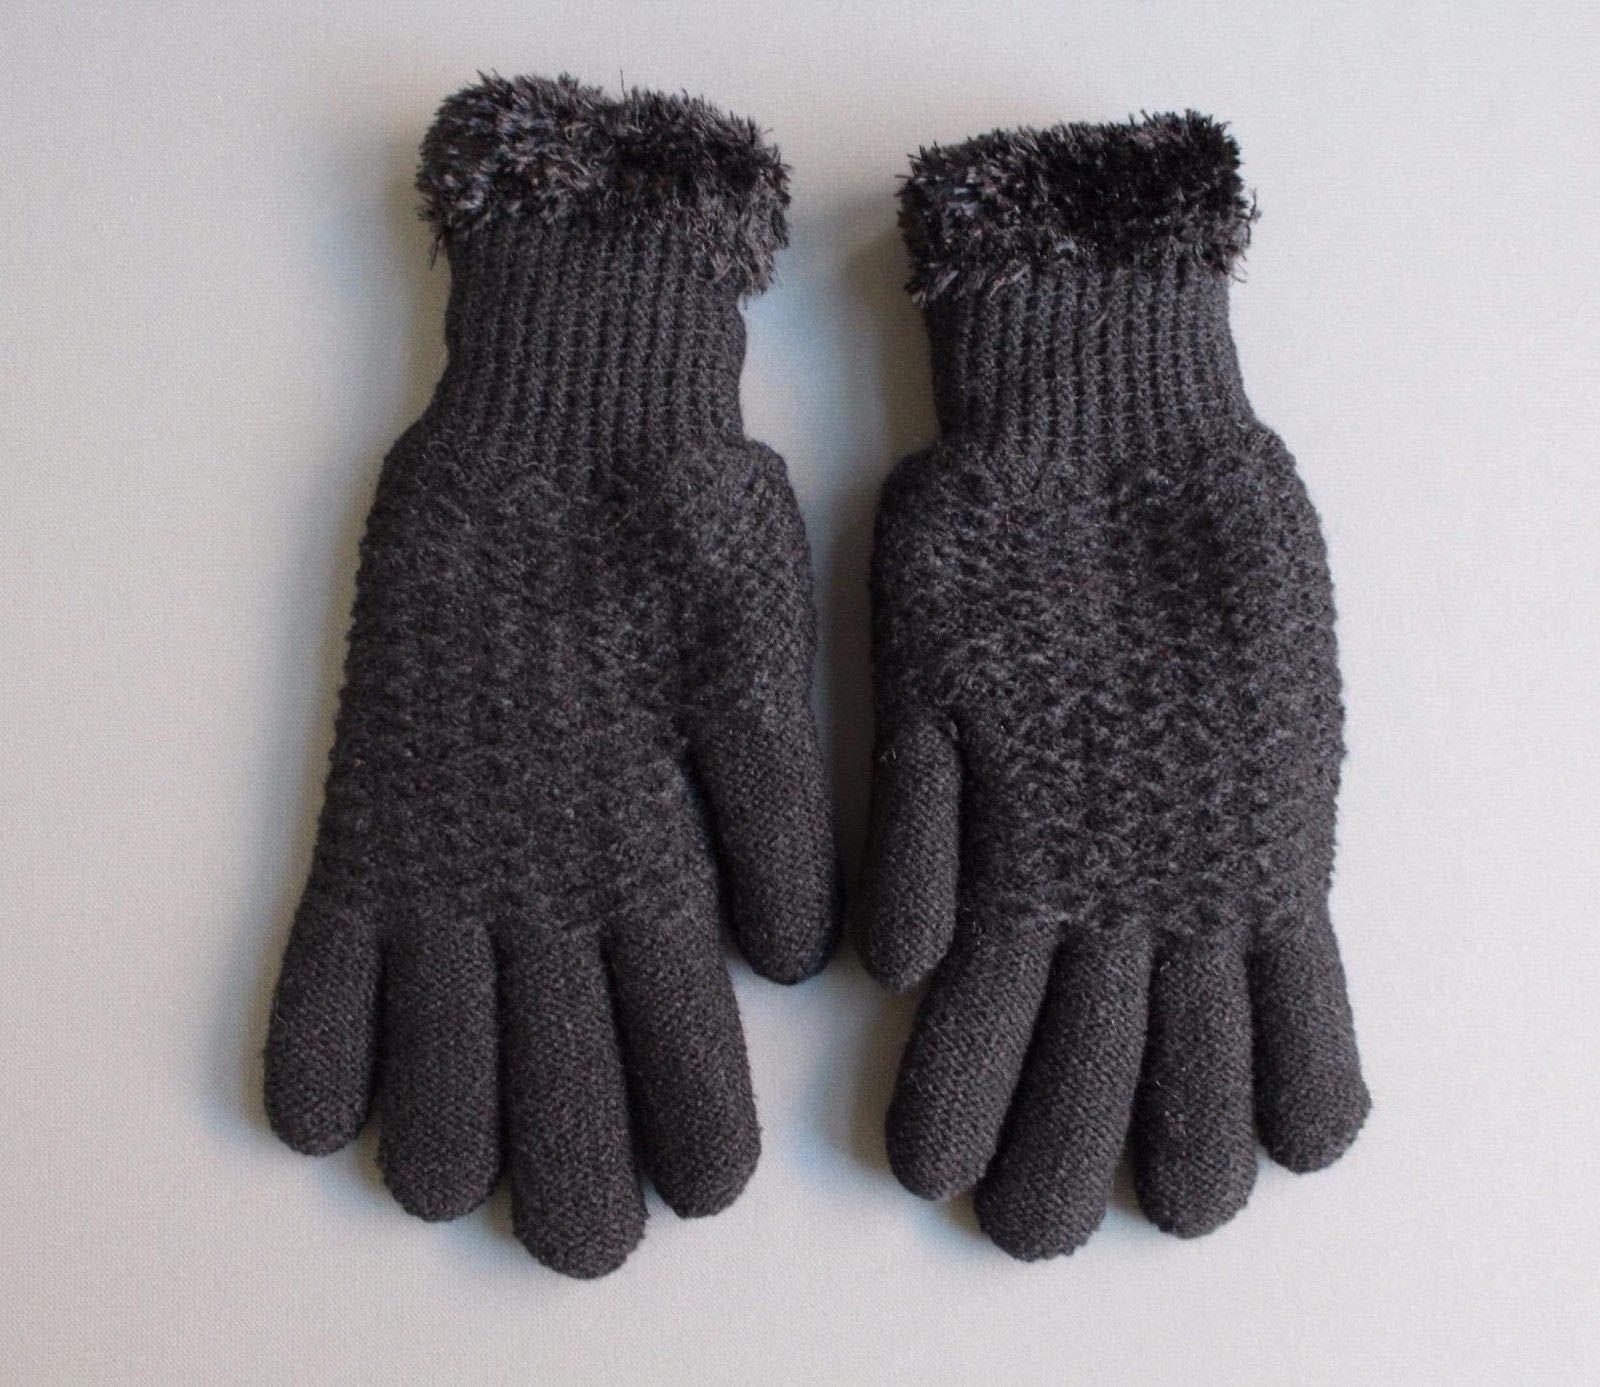 Black lined gloves faux fur knit stretch gloves winter super warm ladies